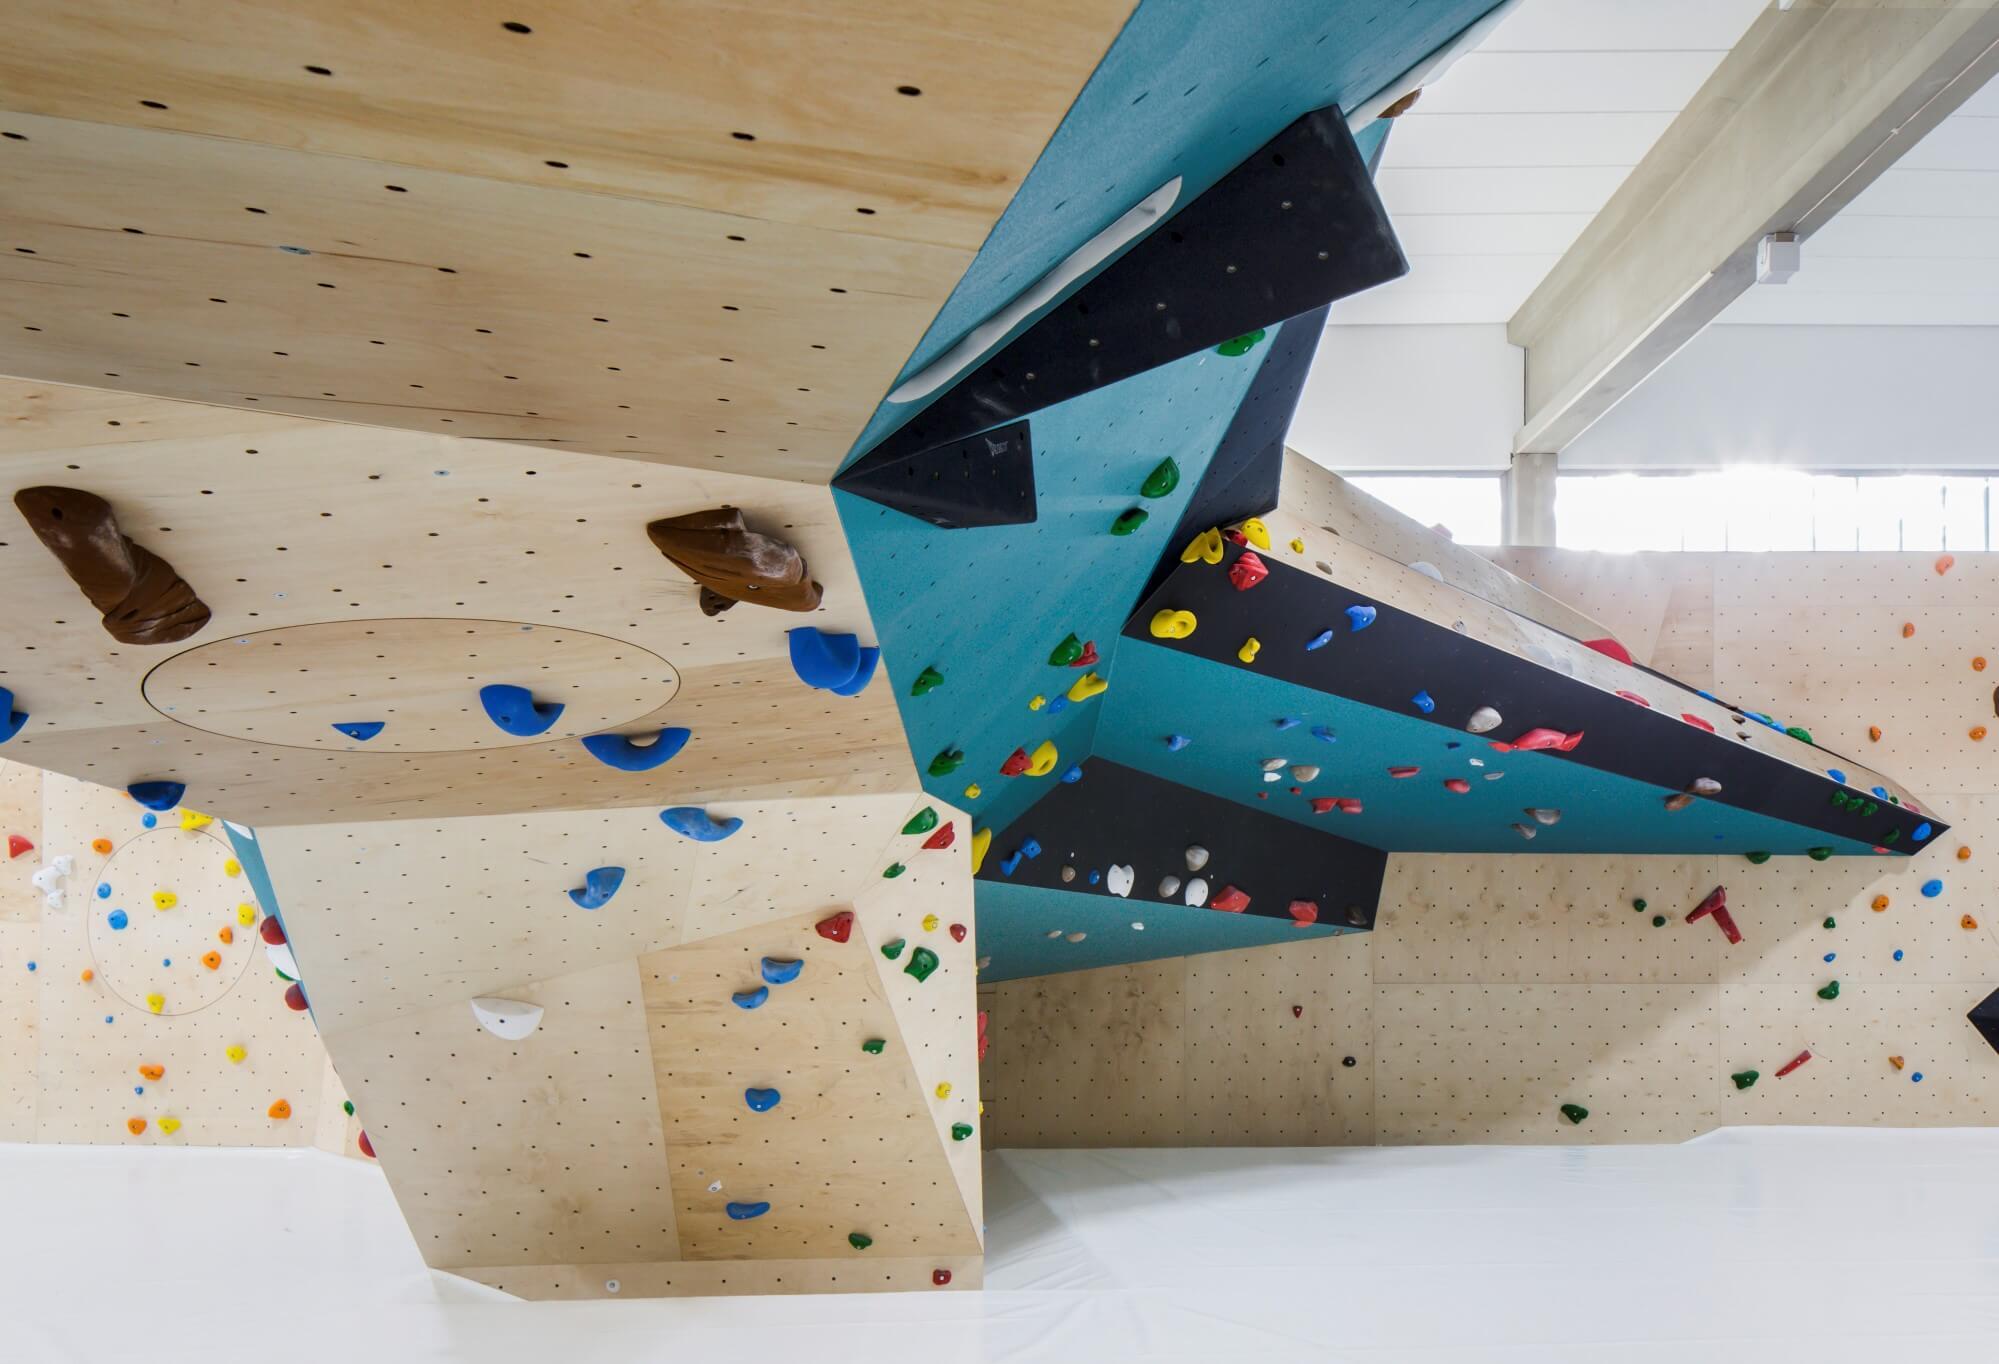 Top Boulderhalle - Boulderhalle Rock Inn Würzburg